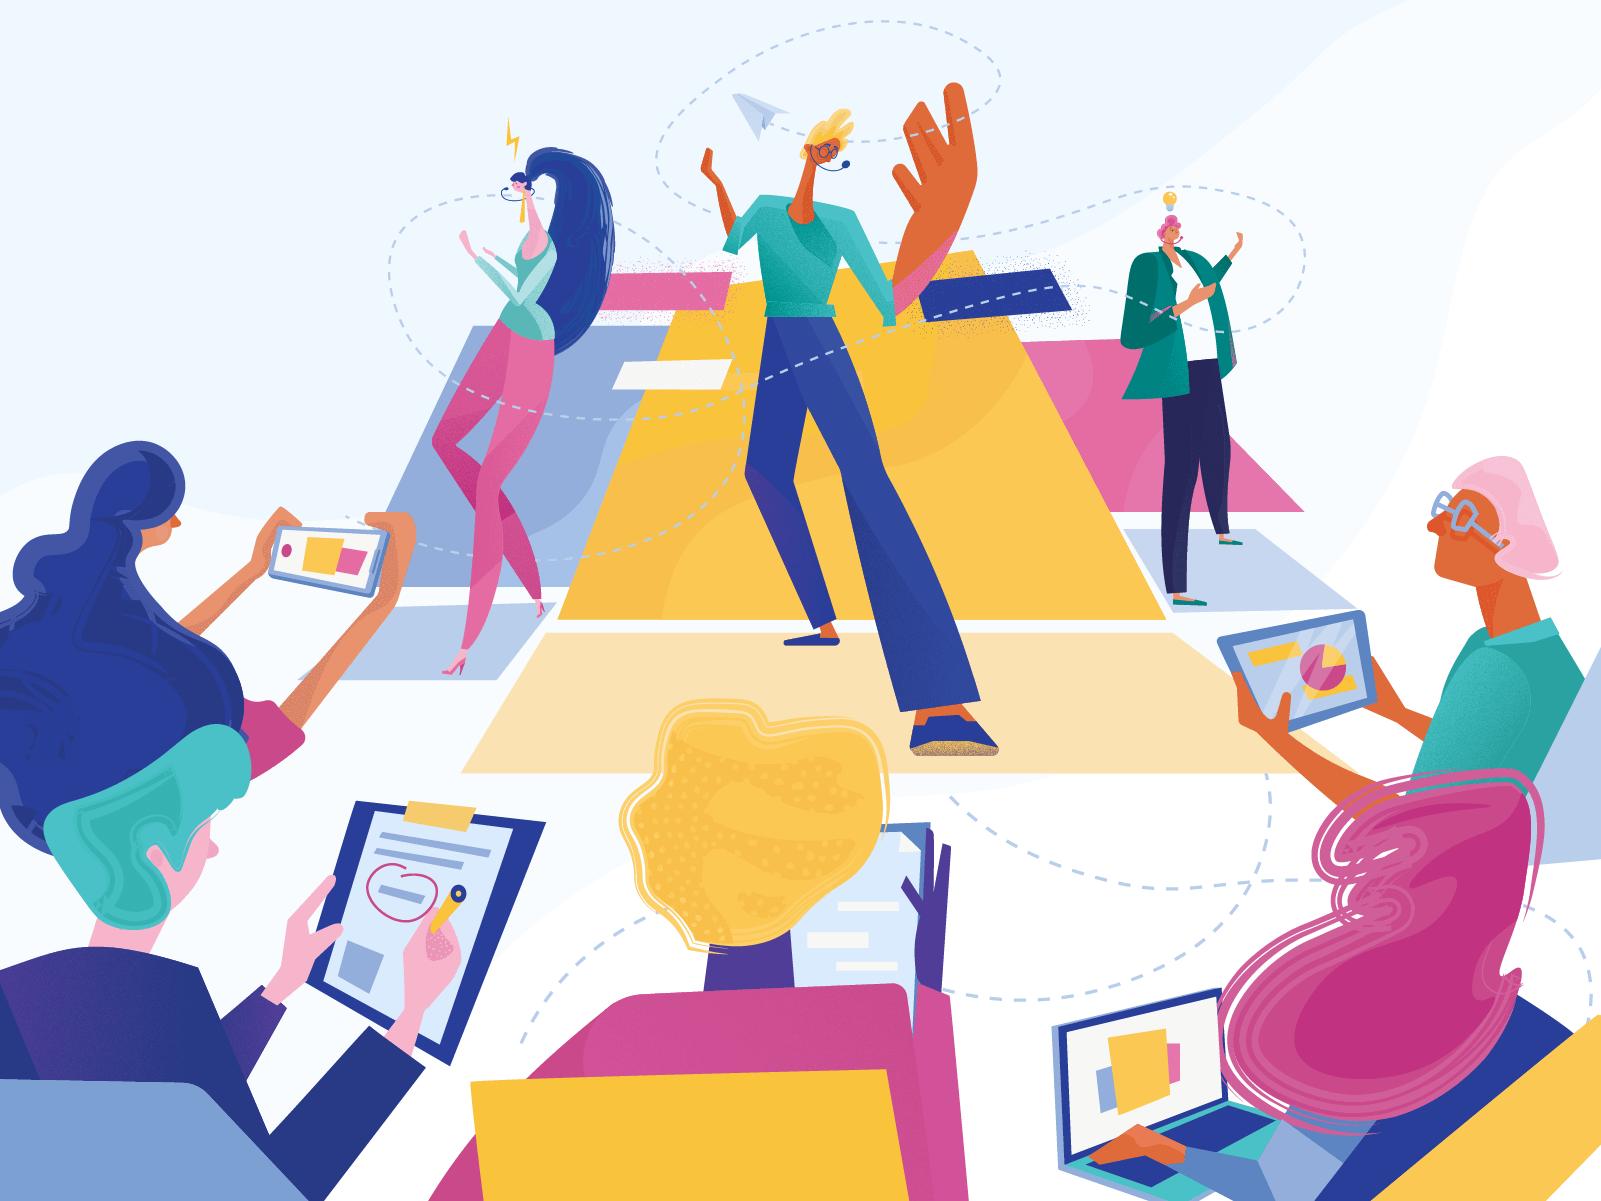 lecture illustration design